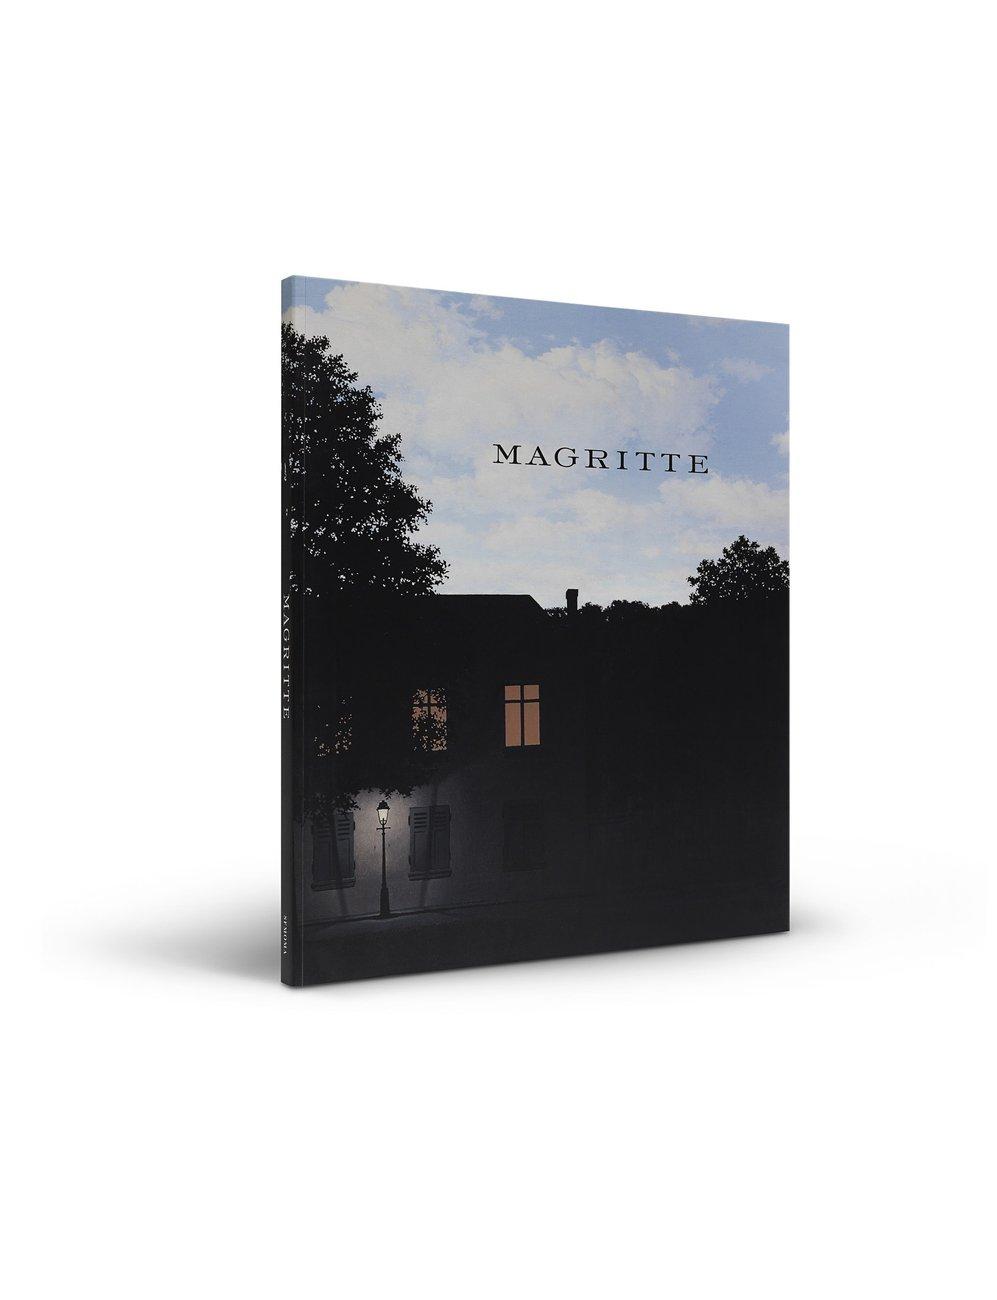 Magritte publication cover